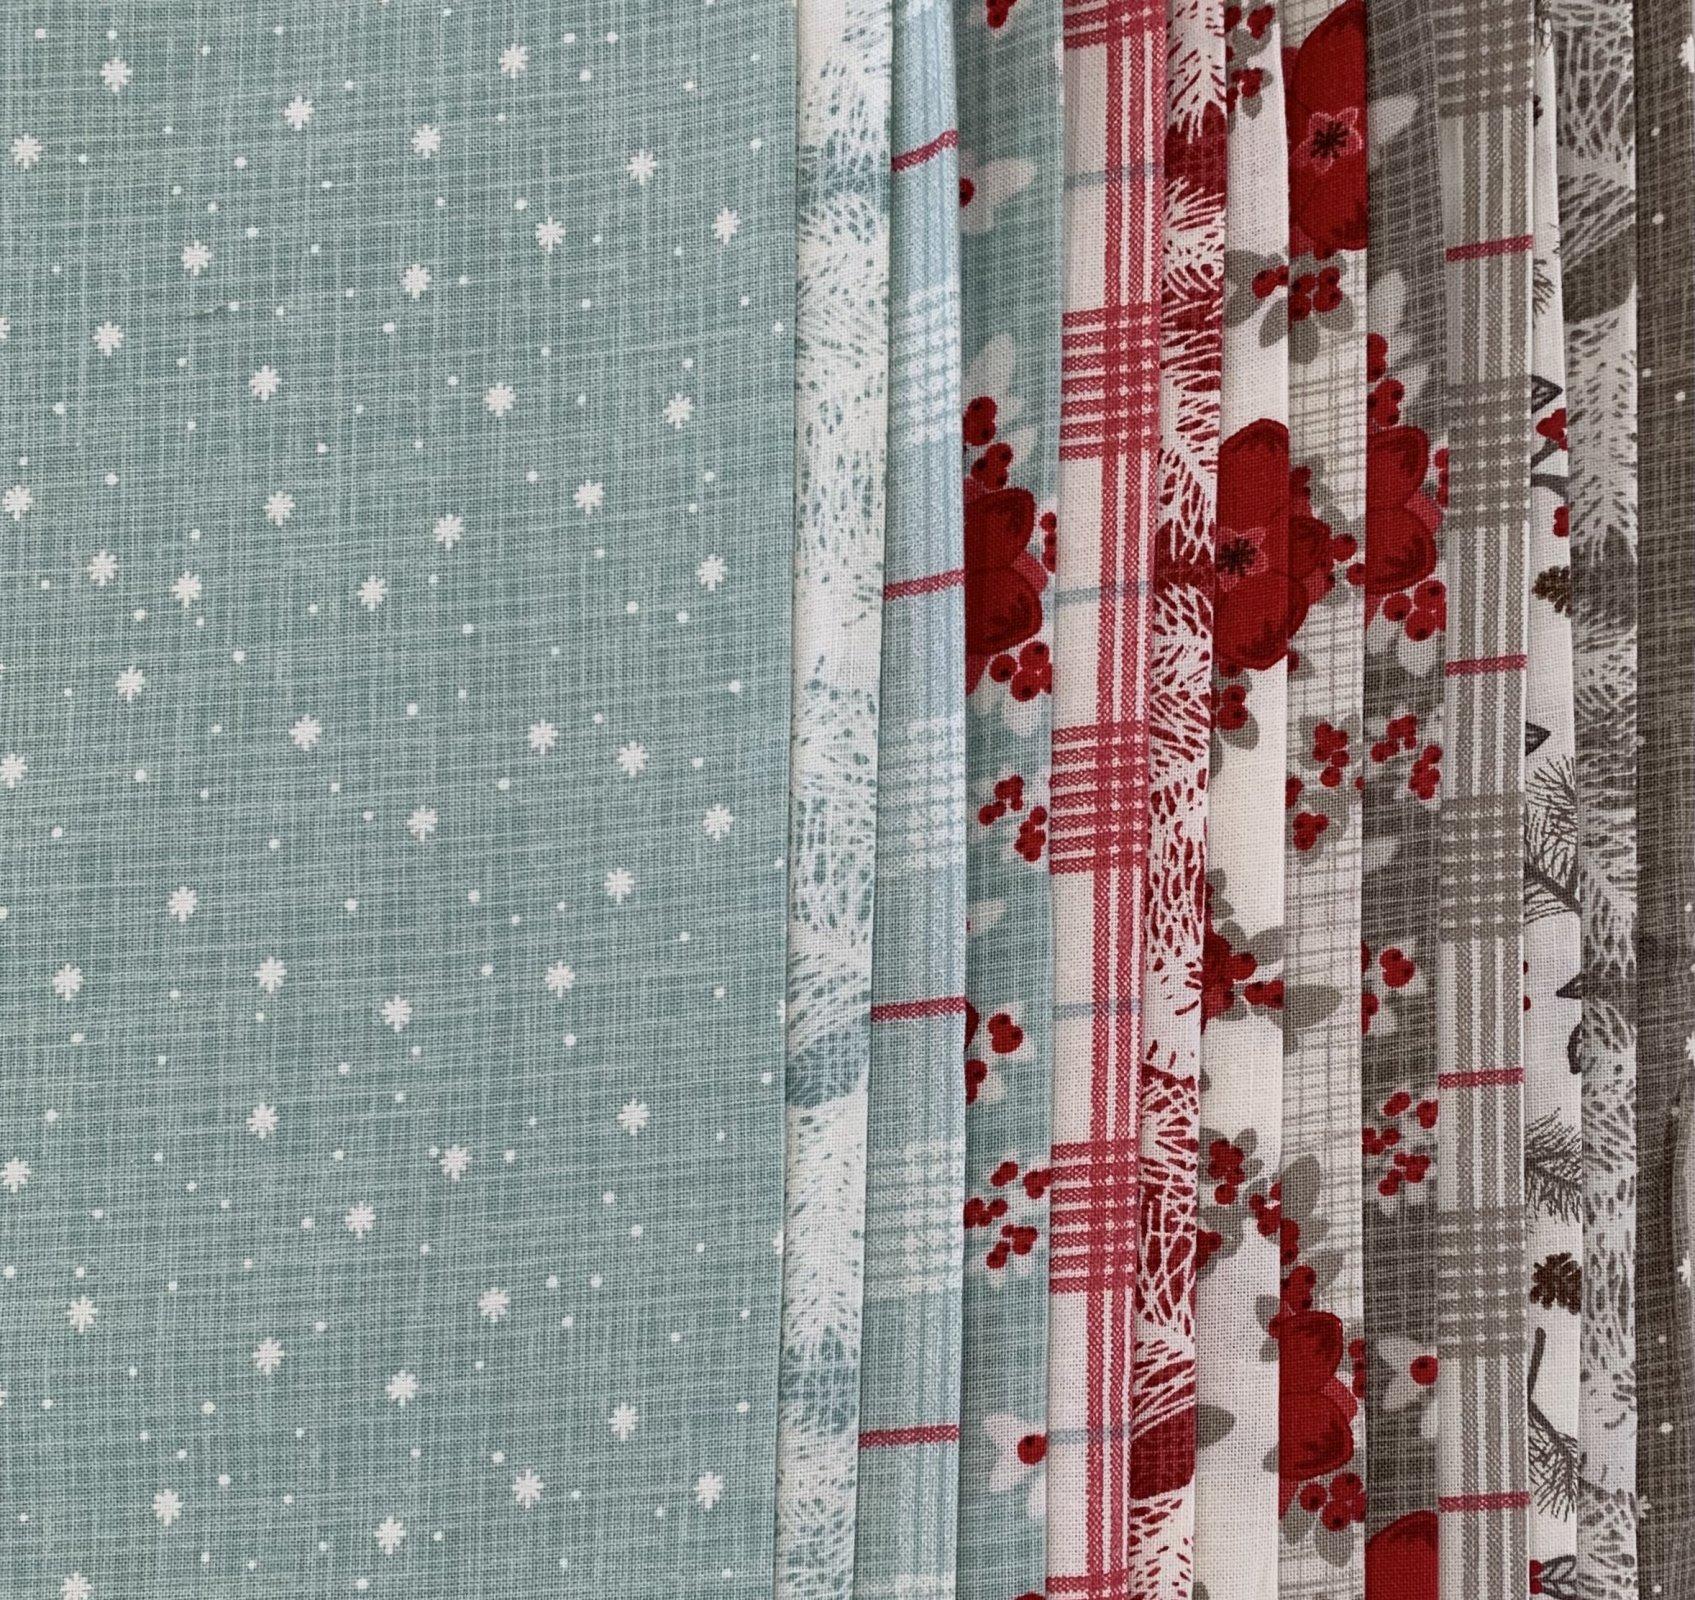 Return to Winter's Lane - 10.5 x WOF Roll - 13 pcs